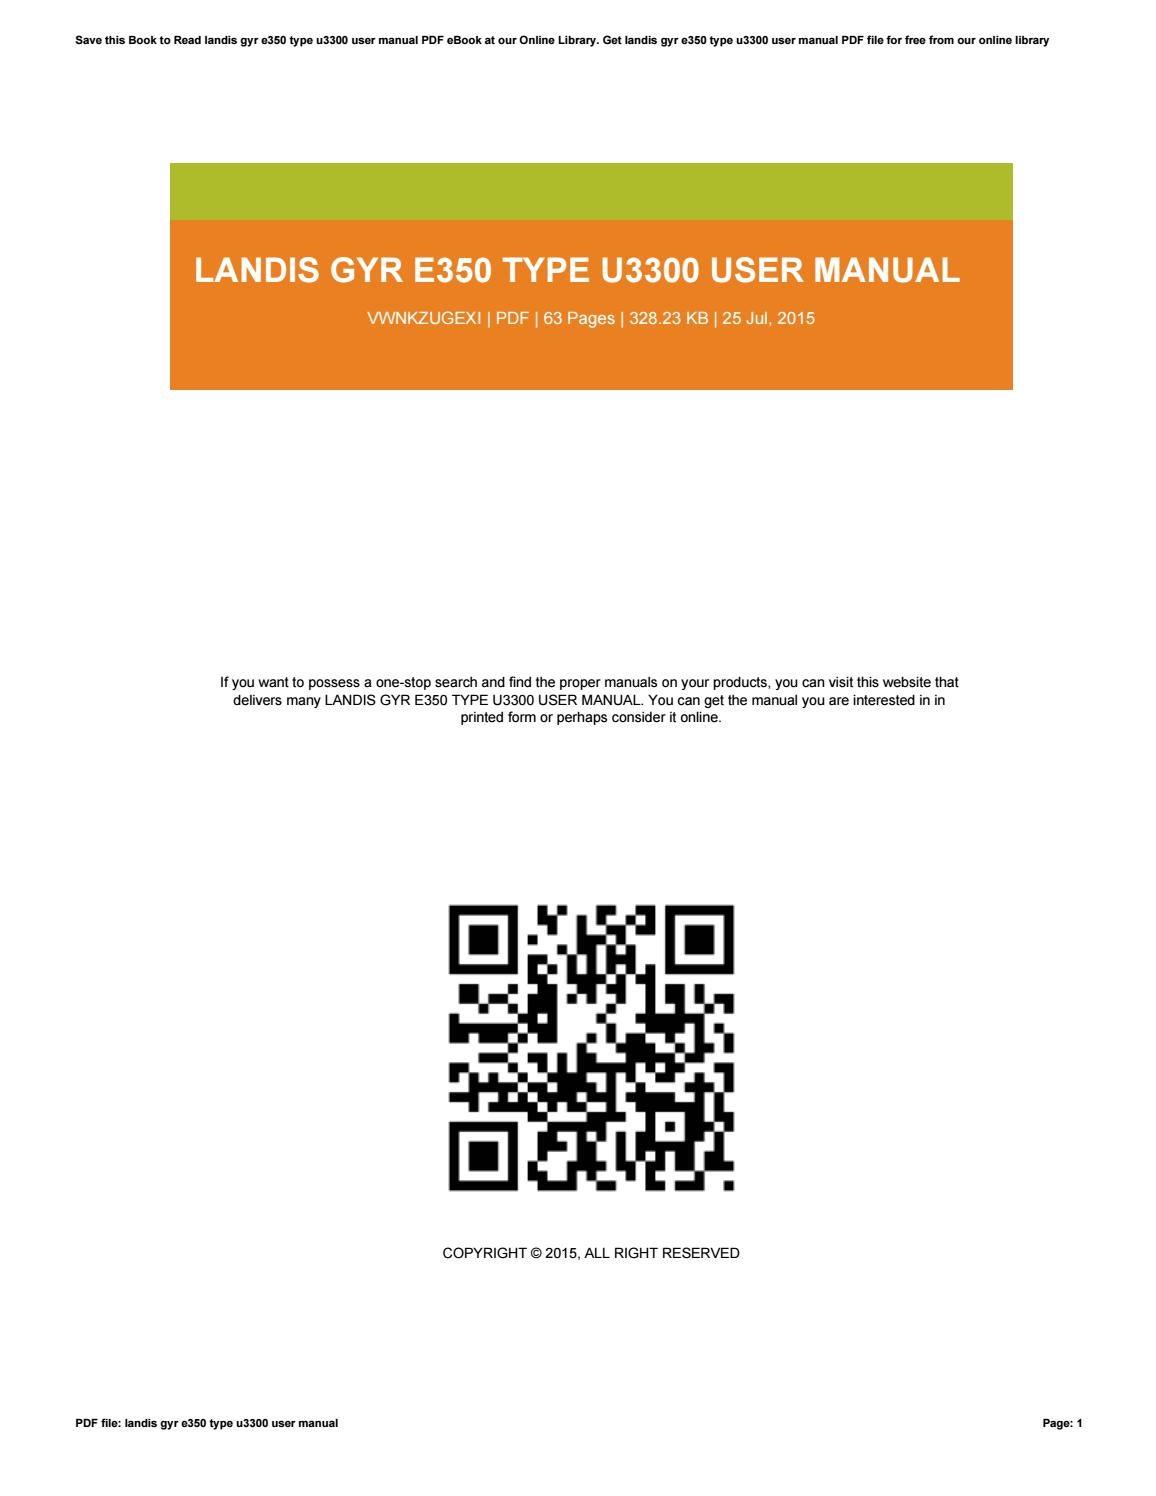 landis gyr e350 u3400 manual